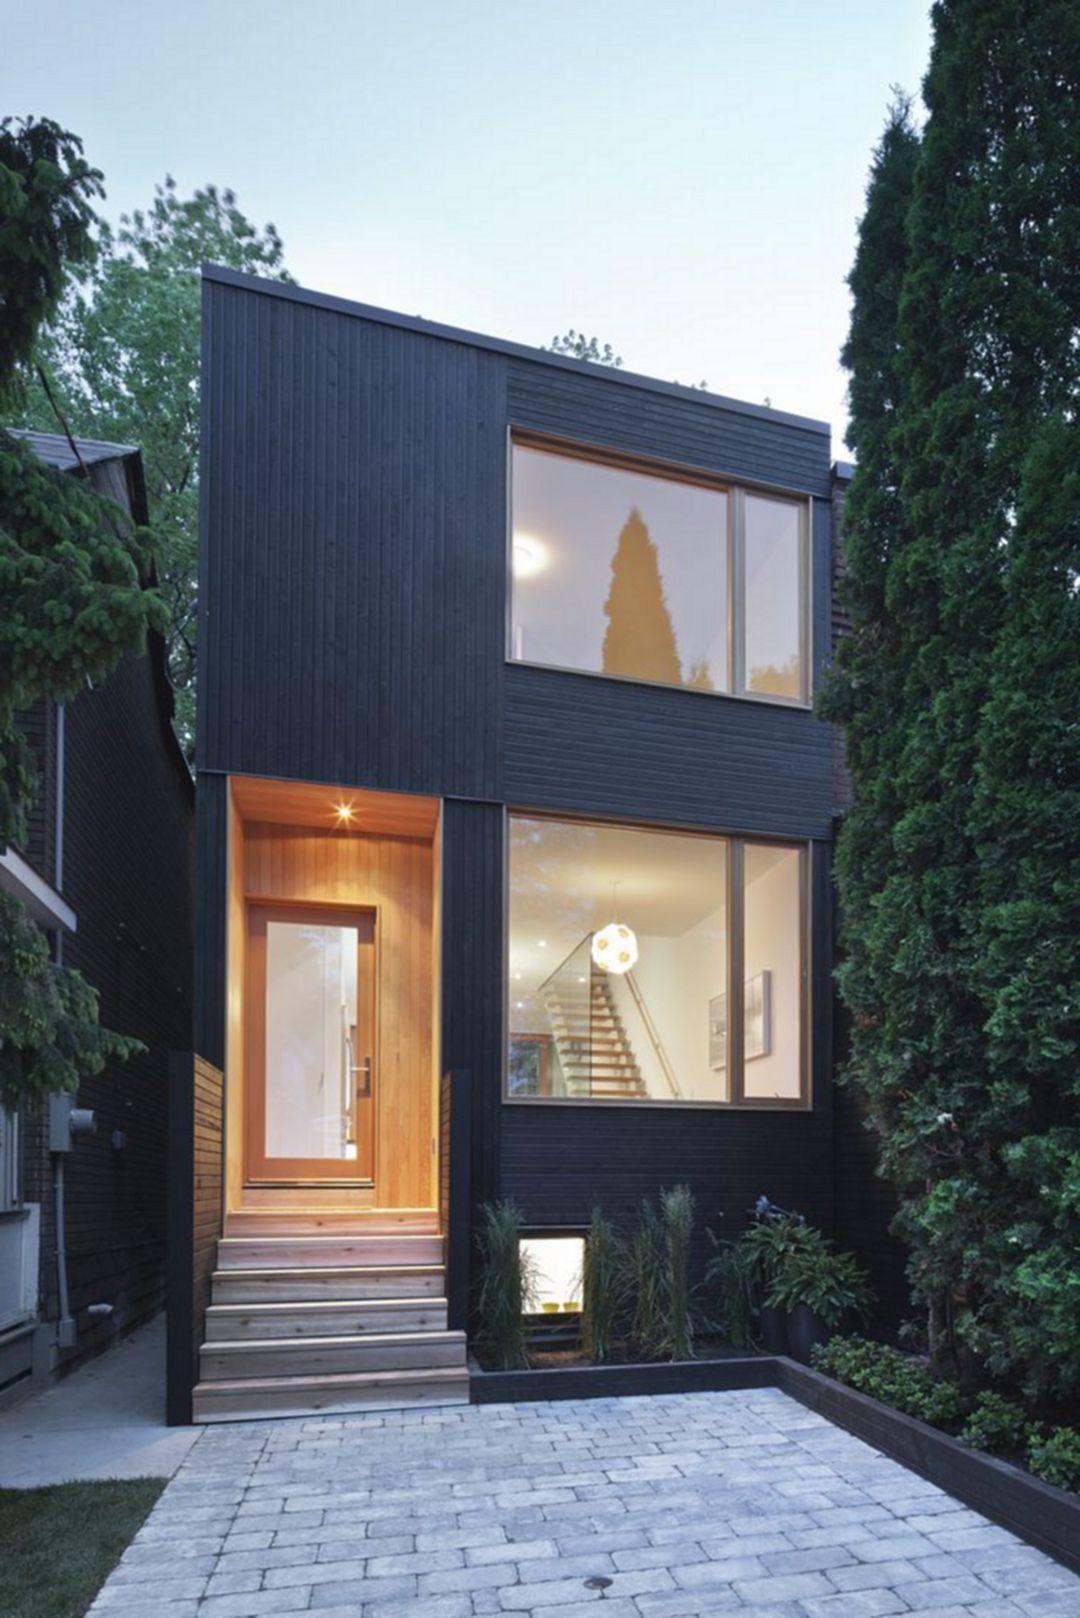 25 Best Small Modern Home Design Idea On A Budget Toronto Houses Small House Design Facade House